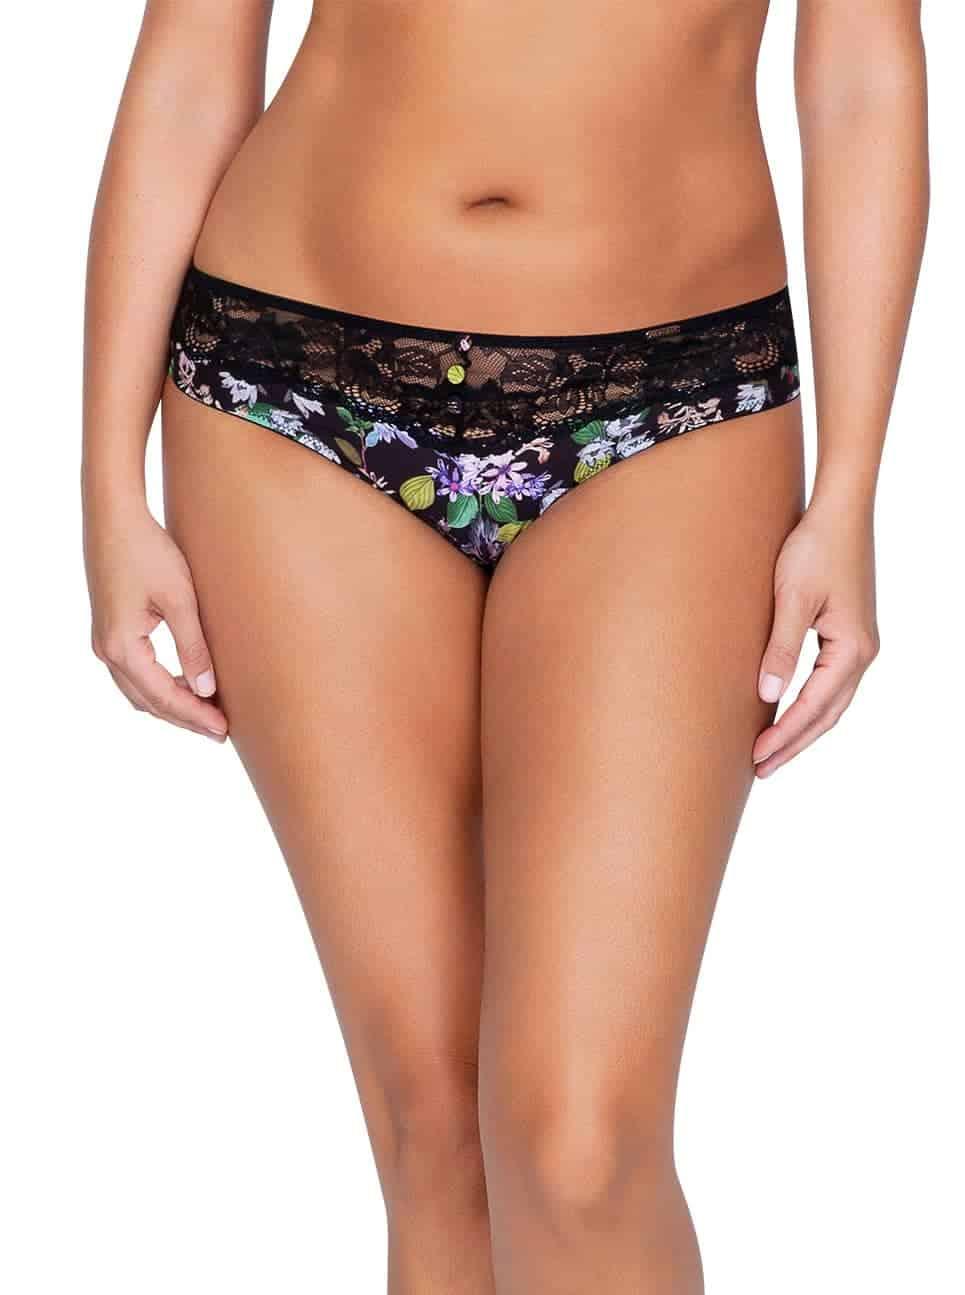 Ava P5373 BikiniFront - Ava Bikini - Black Floral - P5373